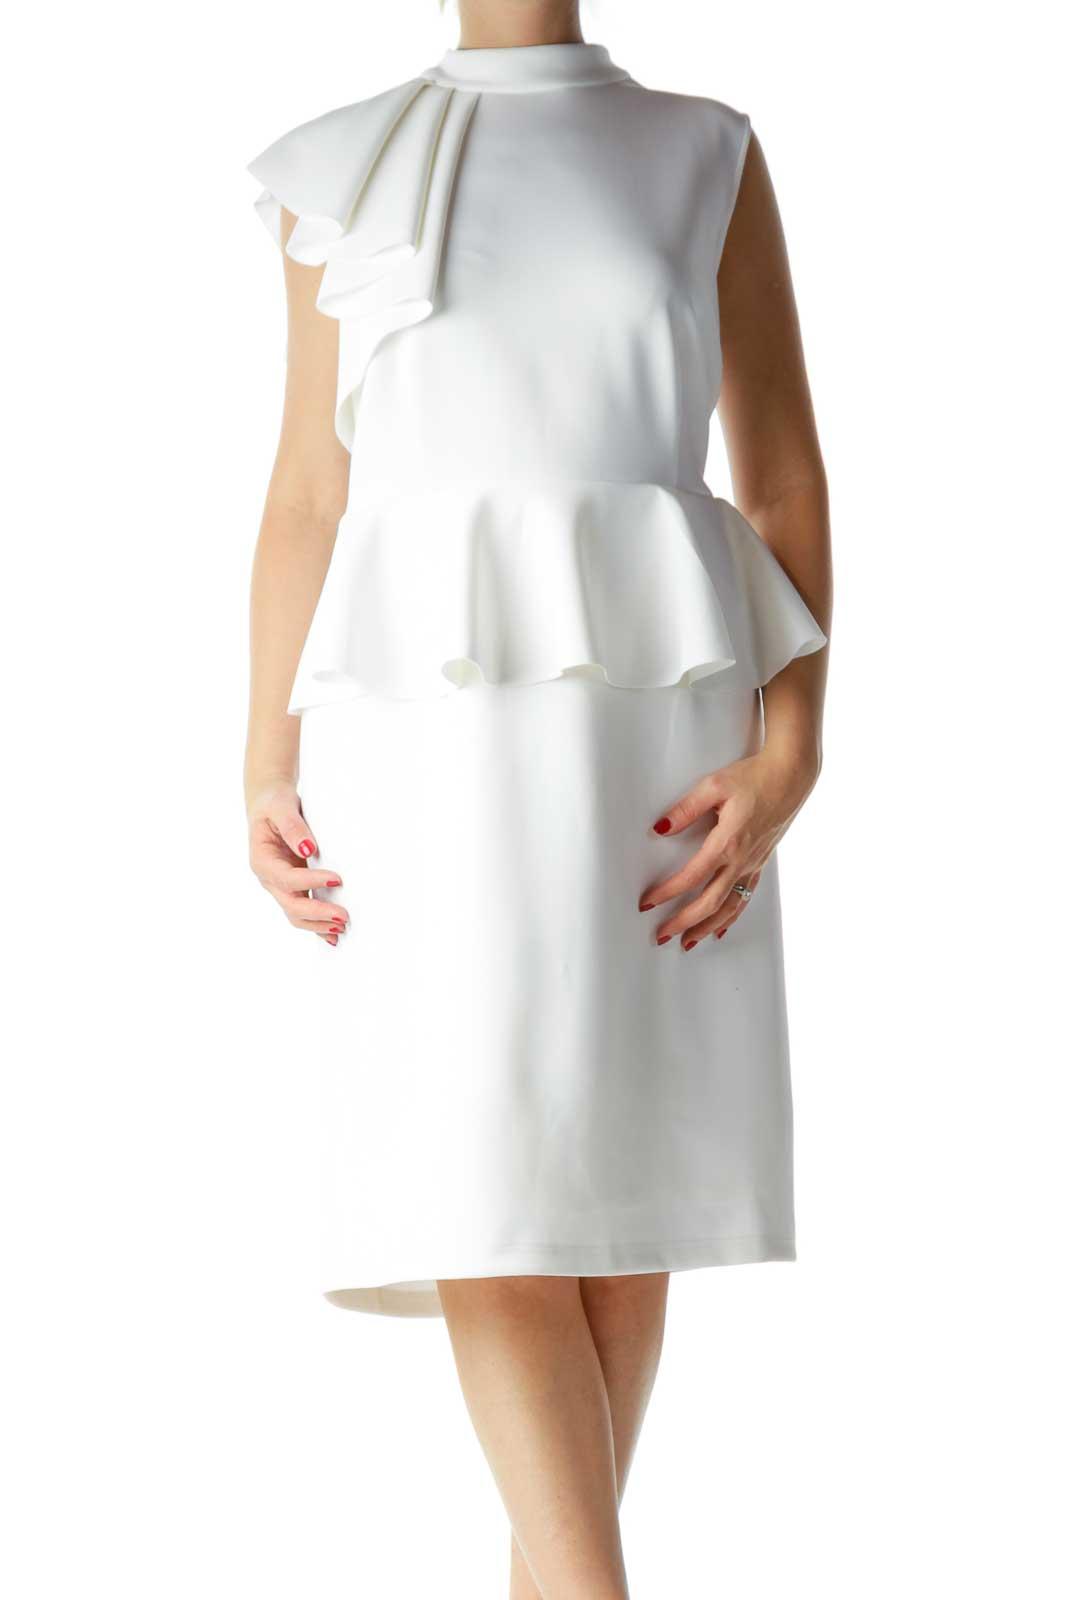 White Sleeveless High Neck Cocktail Dress Front